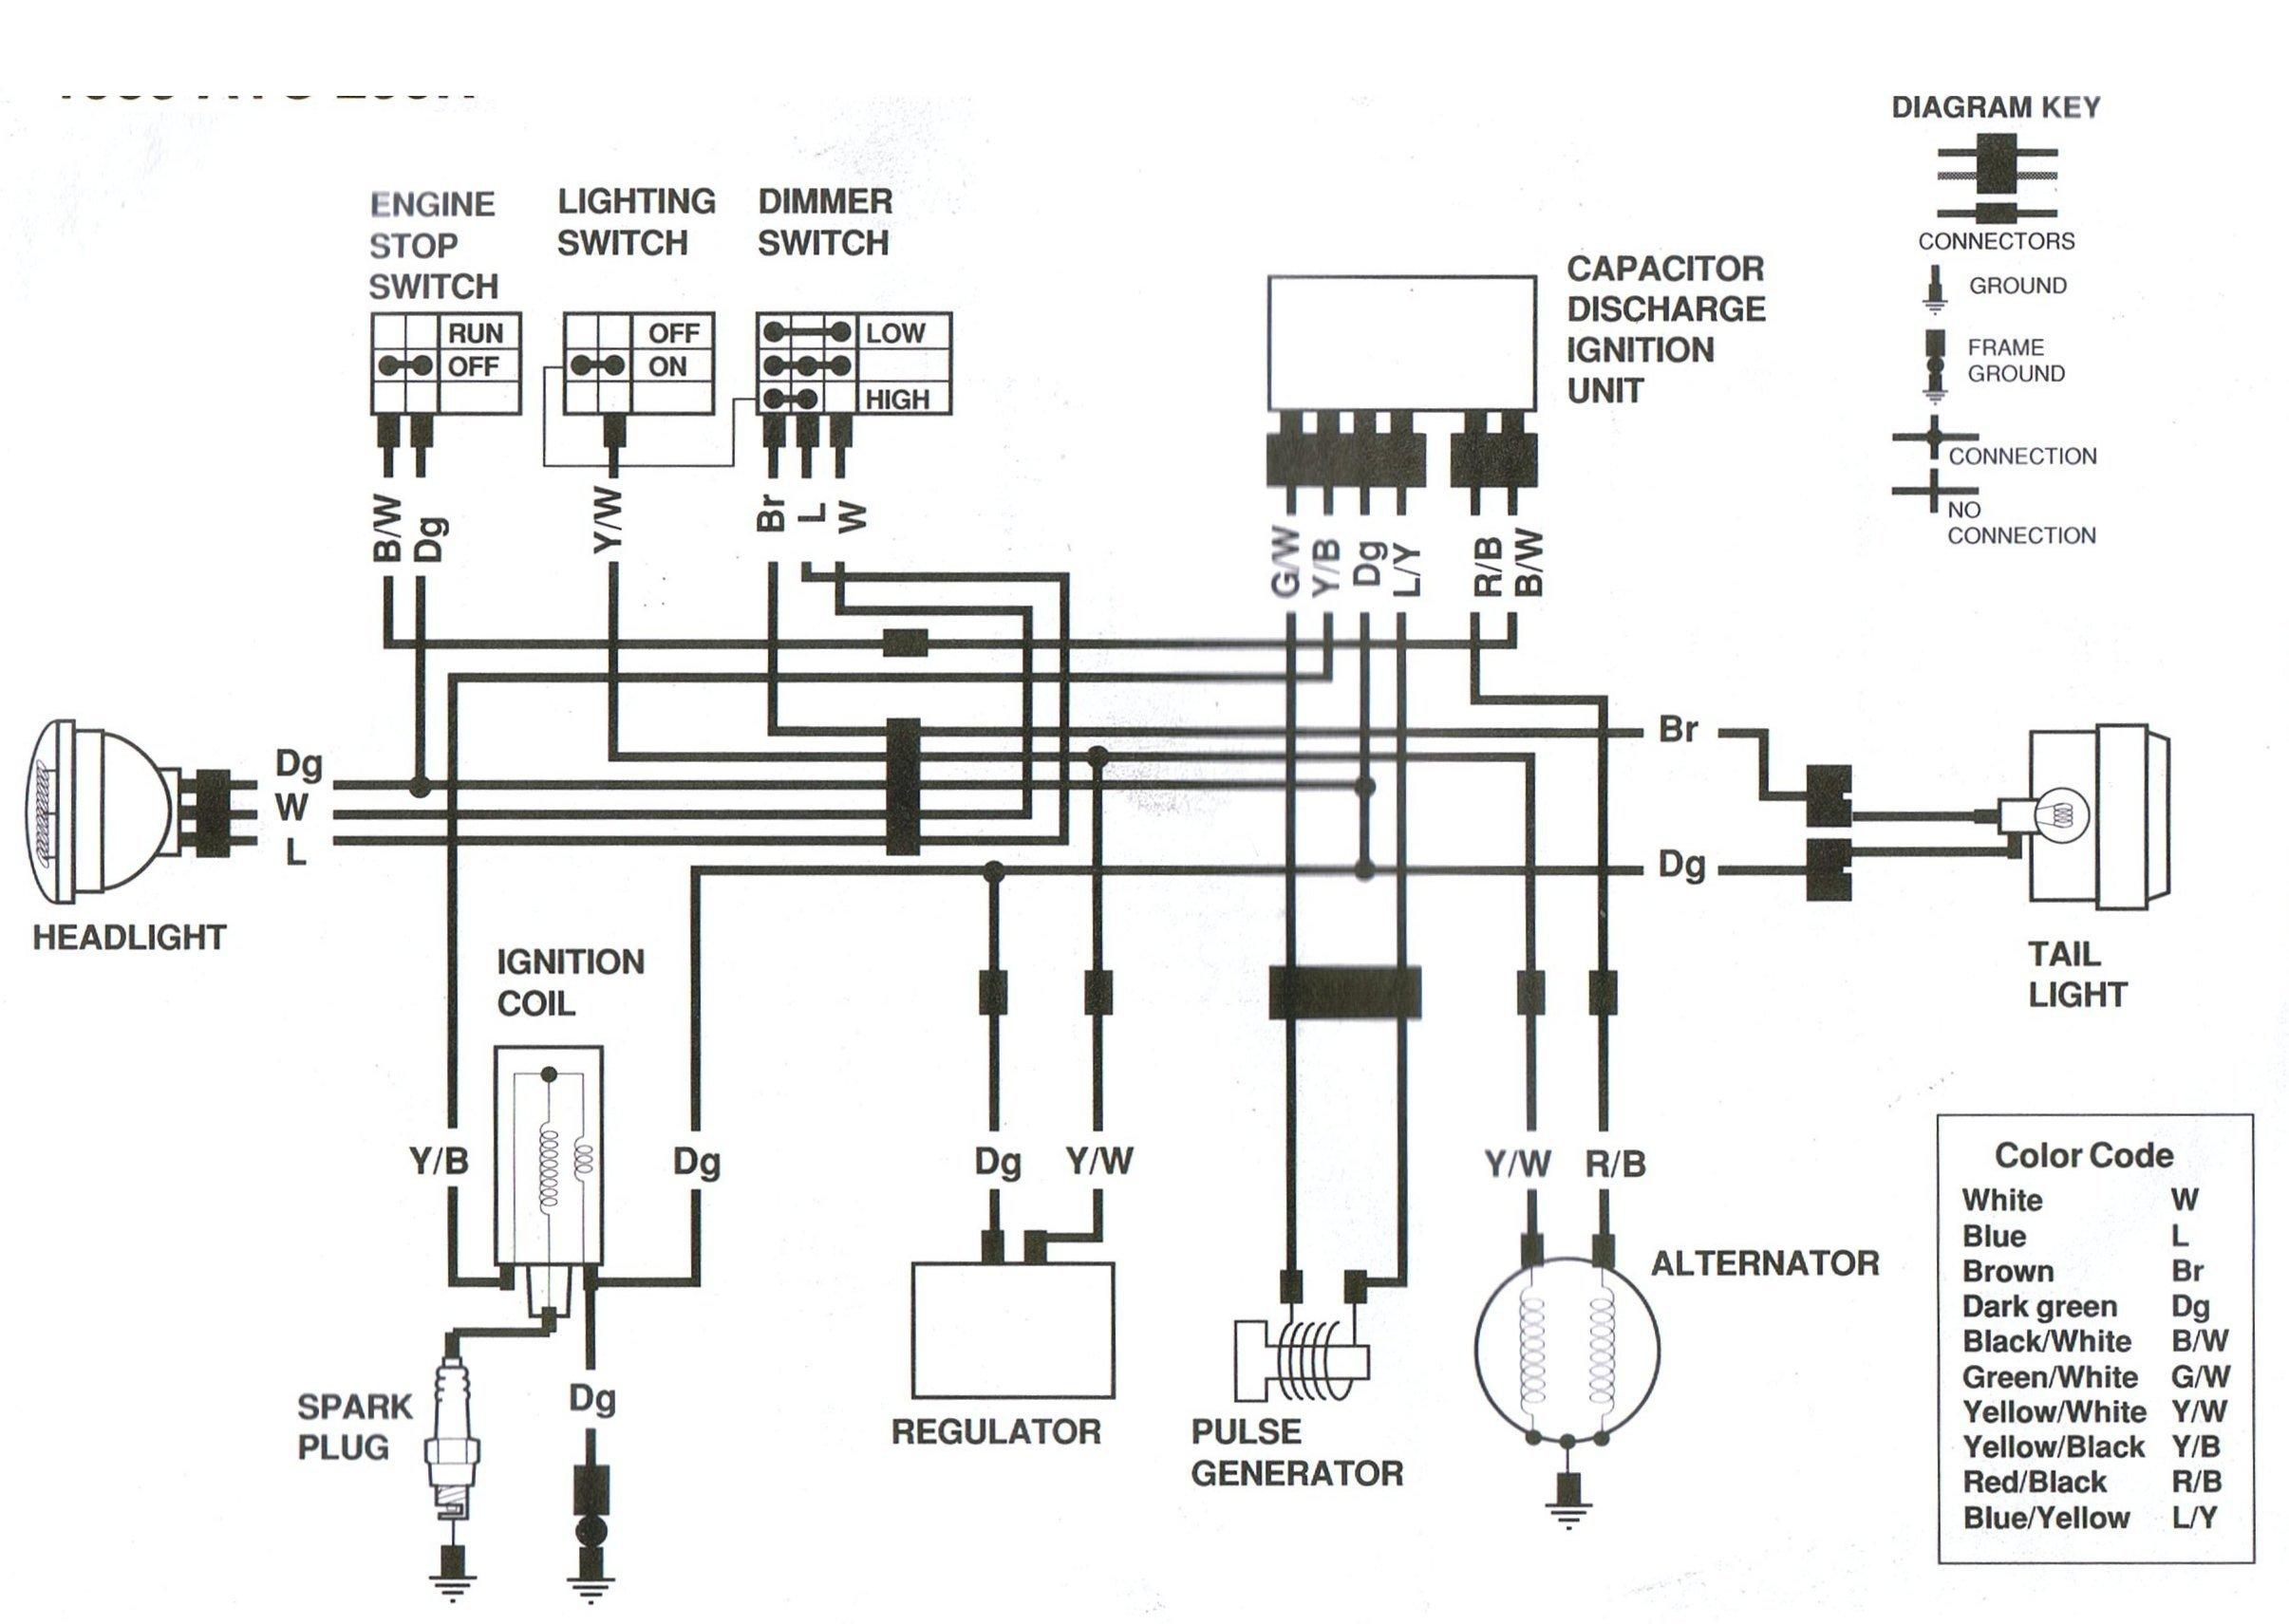 250r wiring diagram.